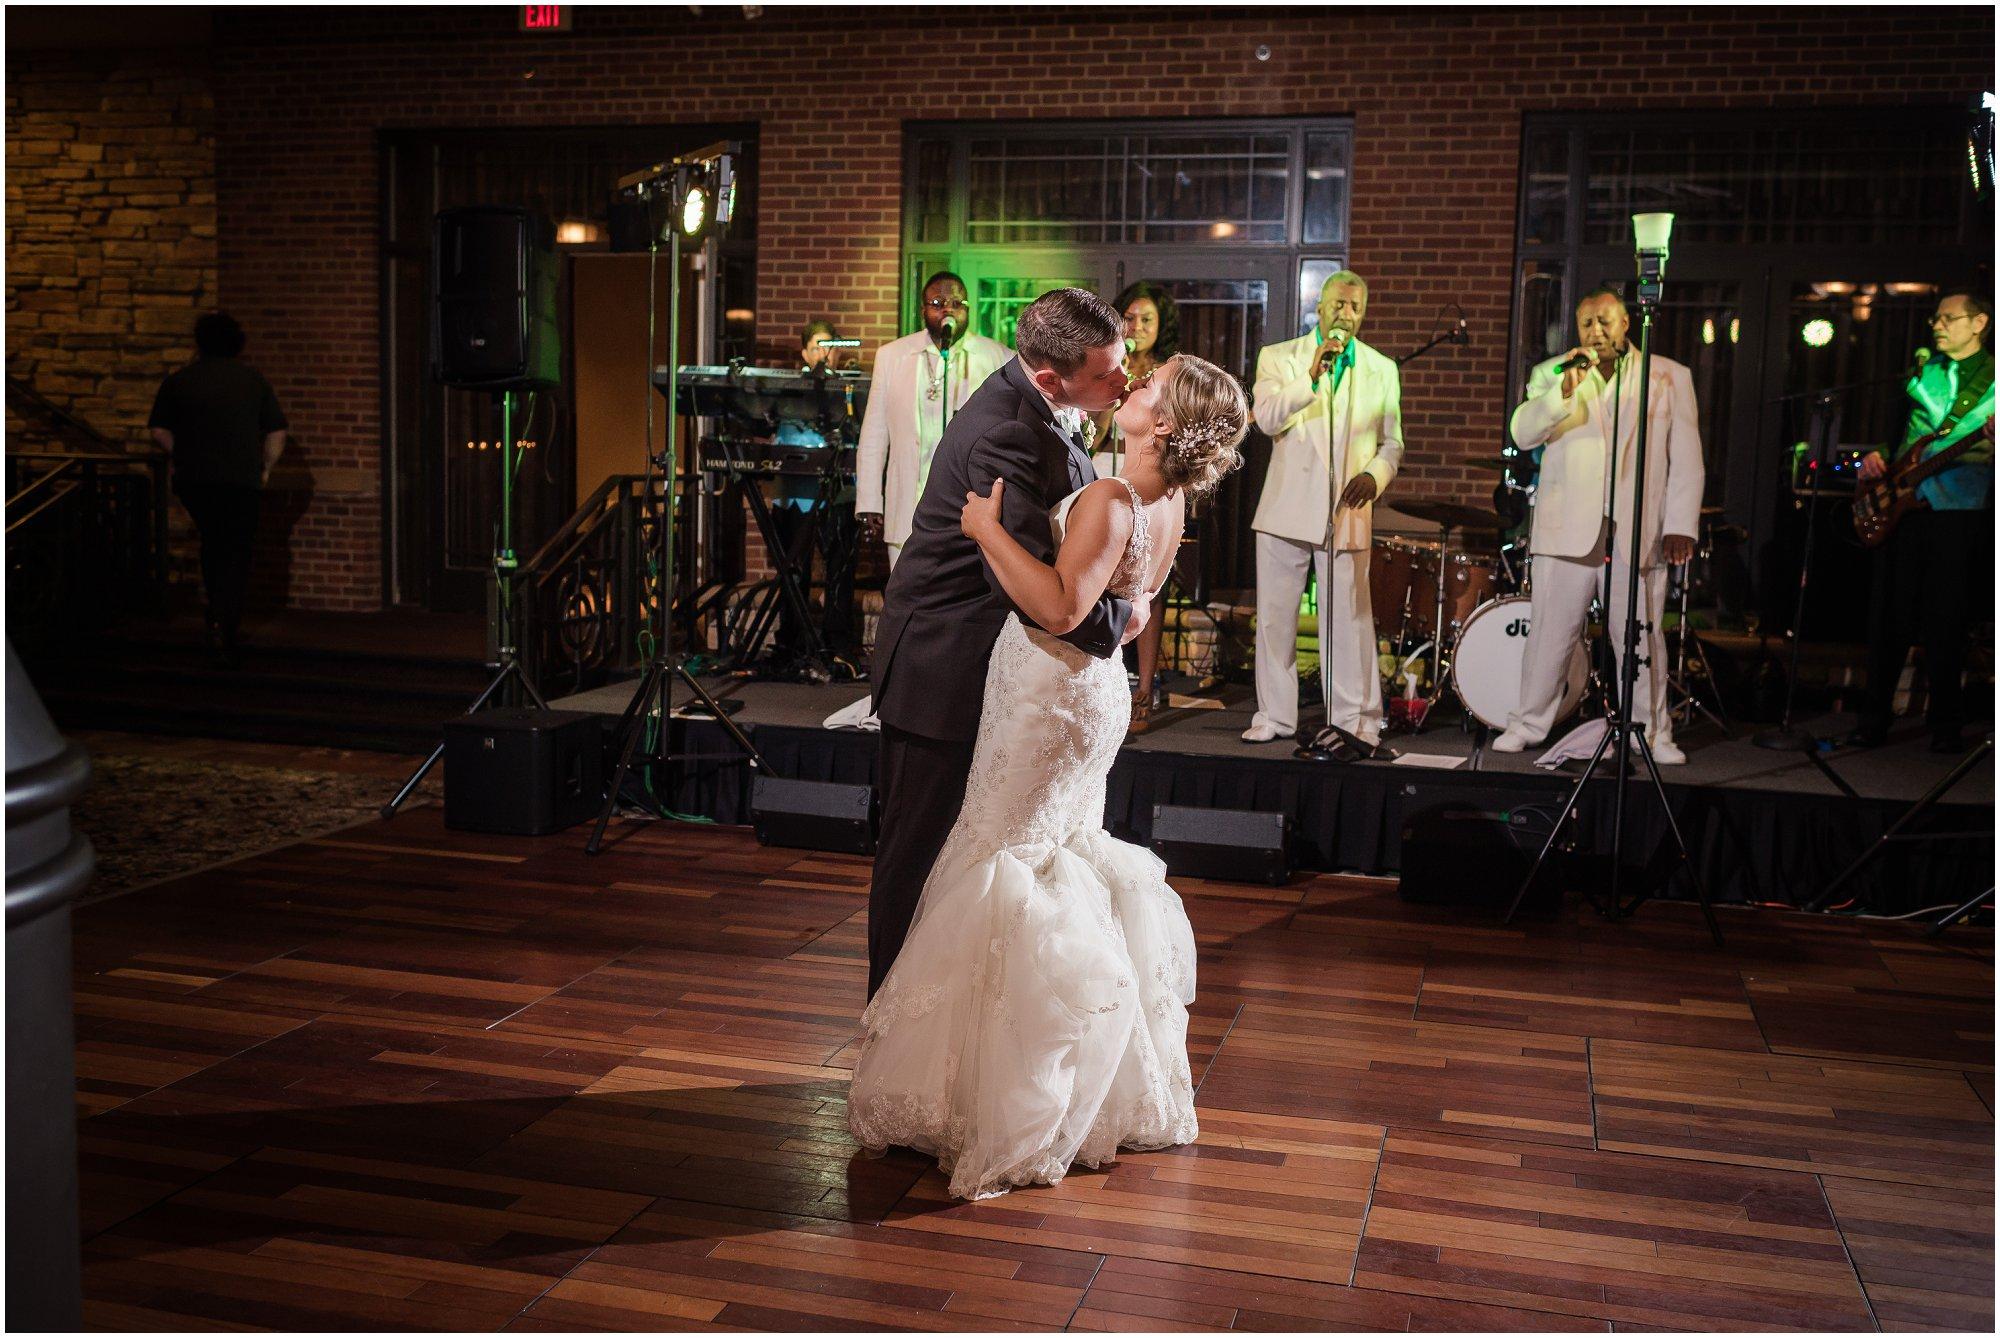 Plymouth_michigan_wedding_photographer_0442.jpg